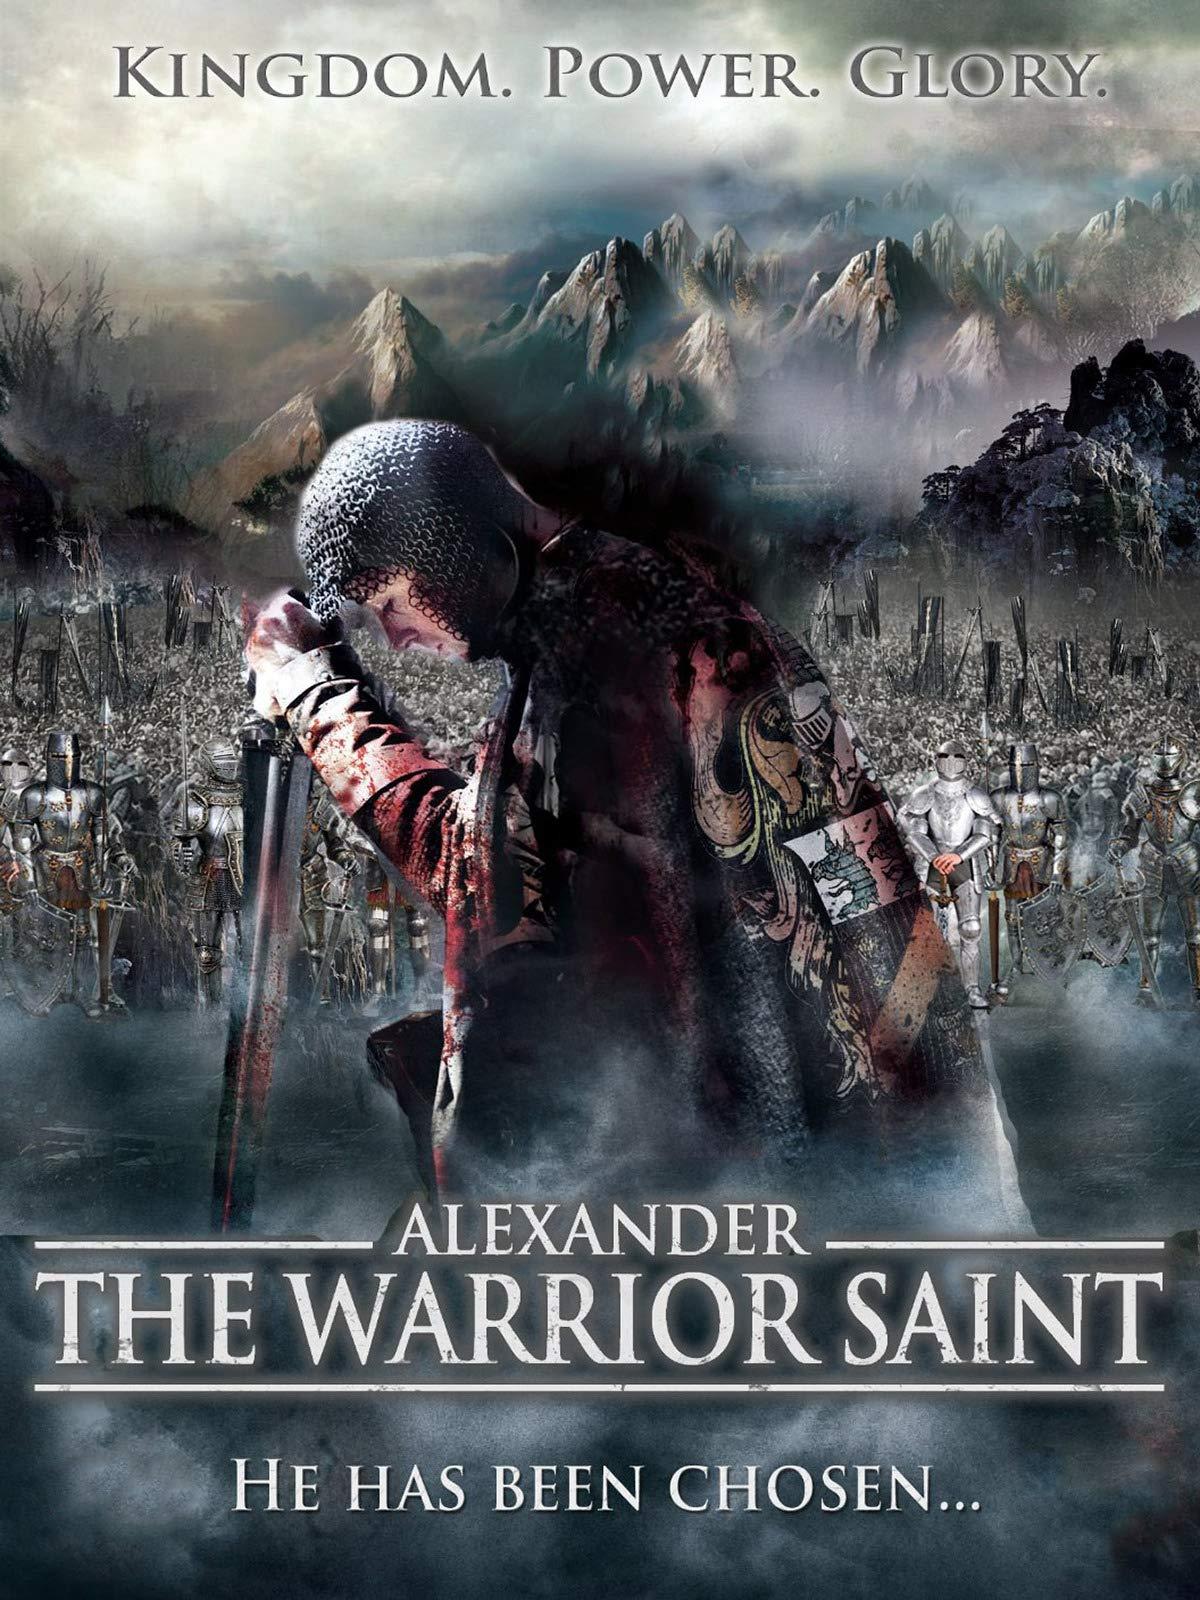 Alexander - The Warrior Saint